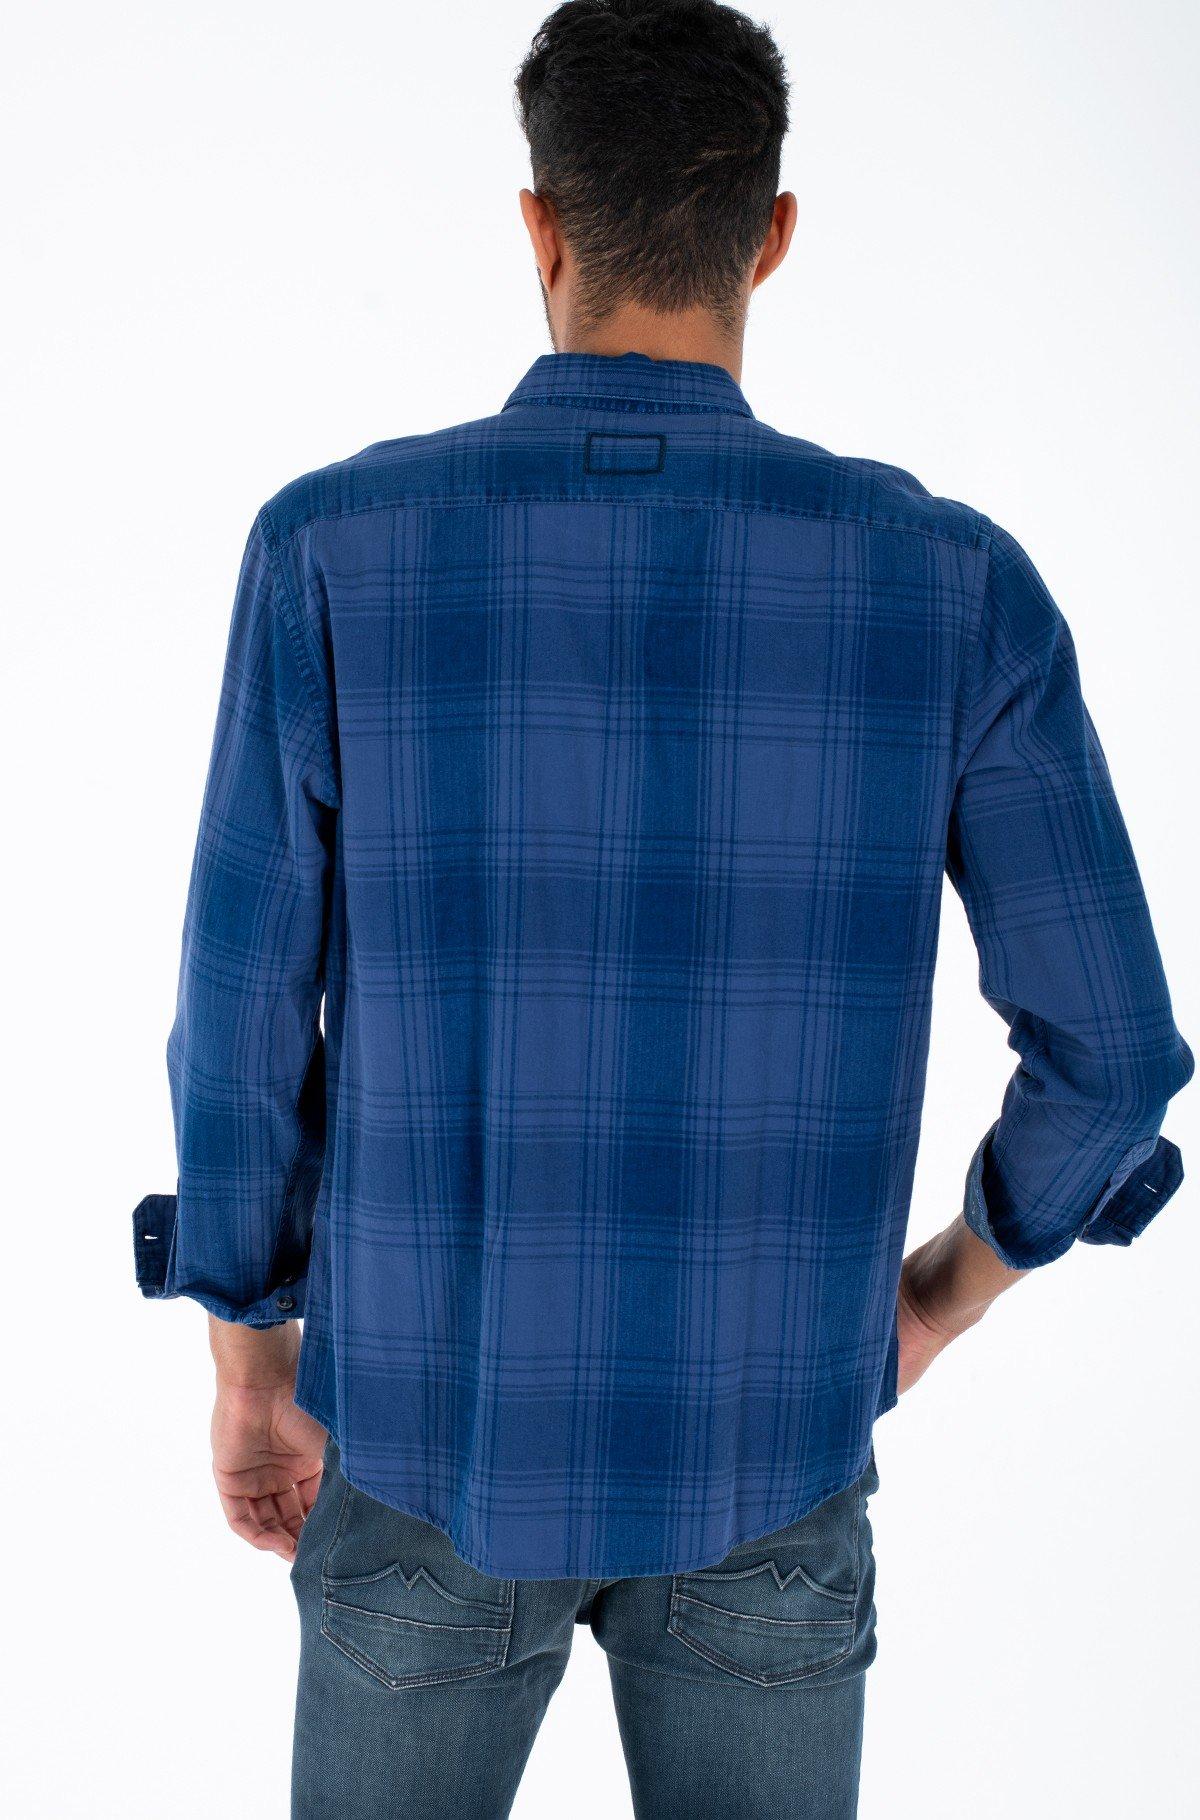 Marškiniai 409117/4S17-full-2